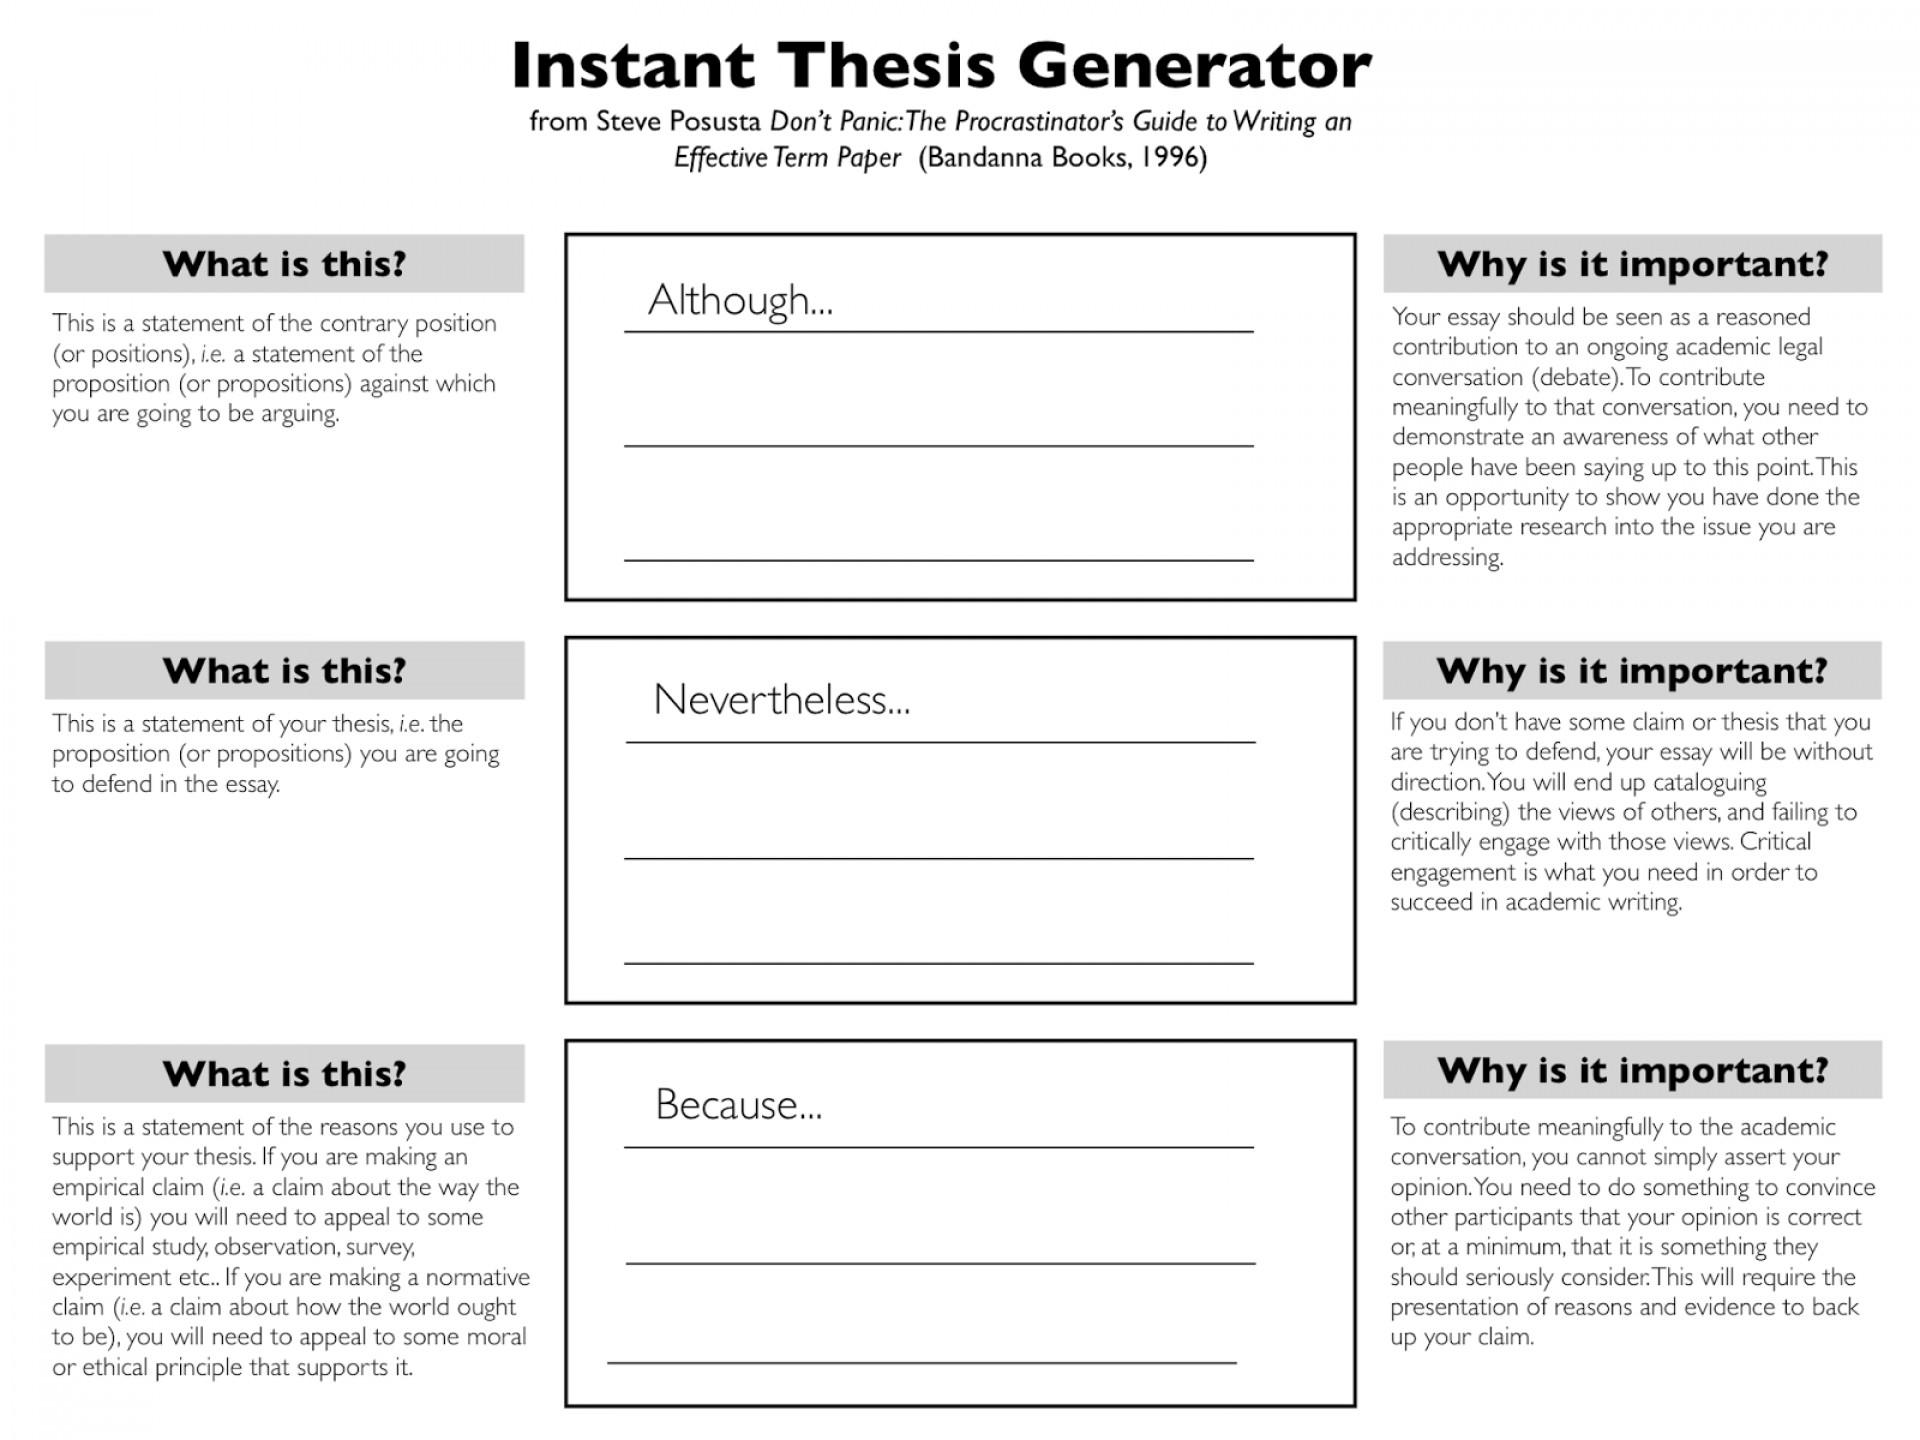 020 Instant2bthesis2bgenerator Essay Example Scholarship Singular Tips Gilman Psc Goldwater 1920